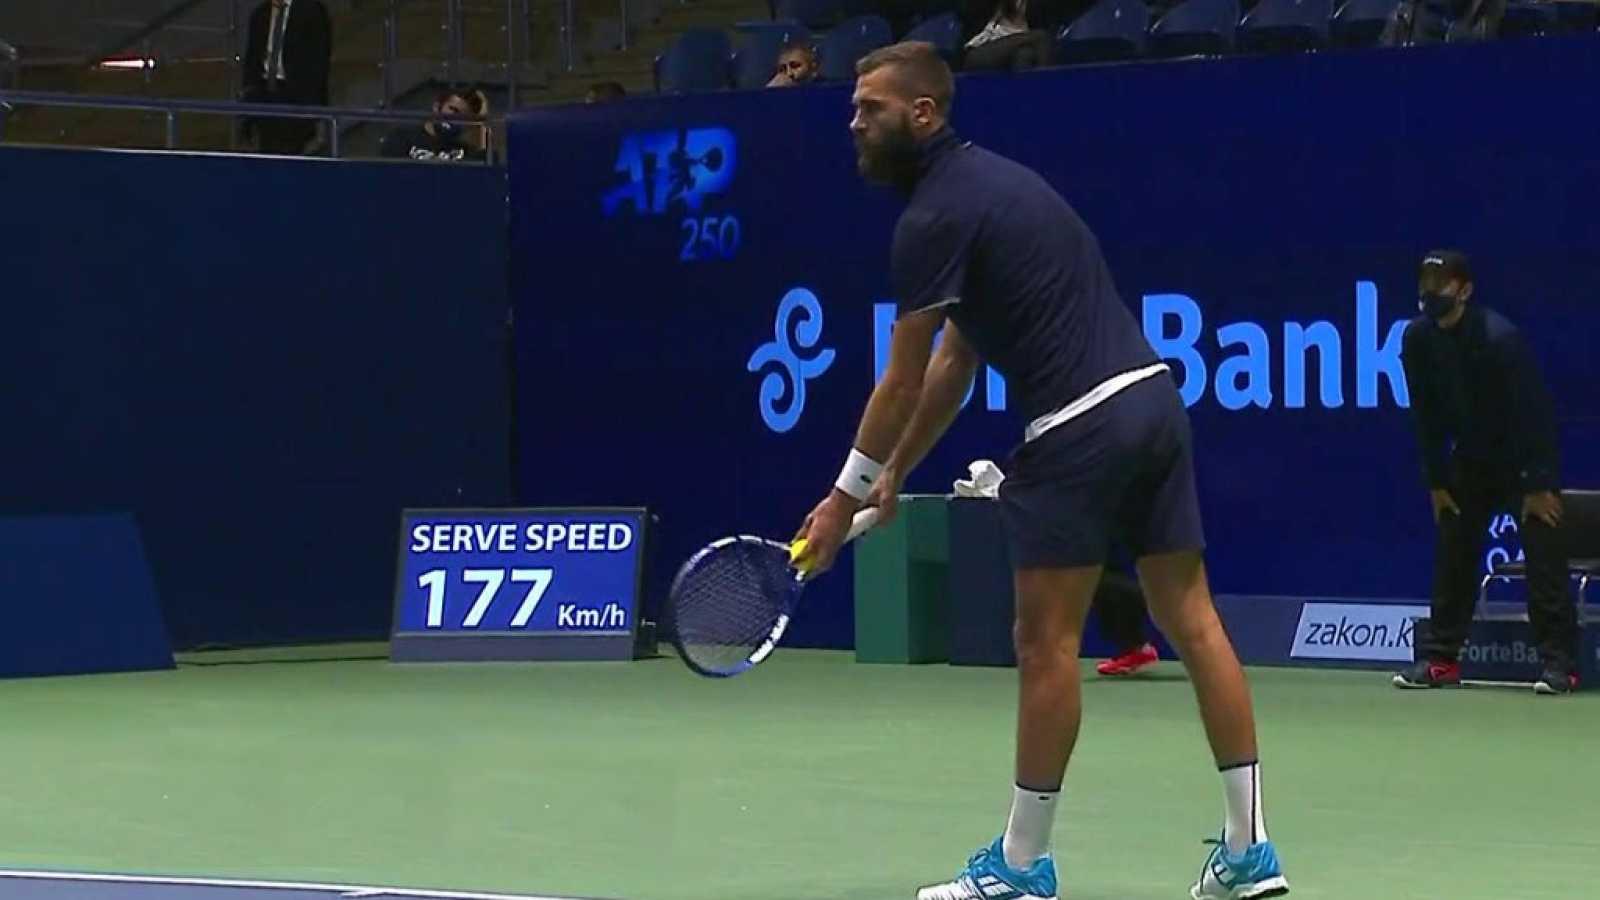 Tenis - ATP 250 Torneo Astaná: B. Paire - M. Kukushkin - ver ahora